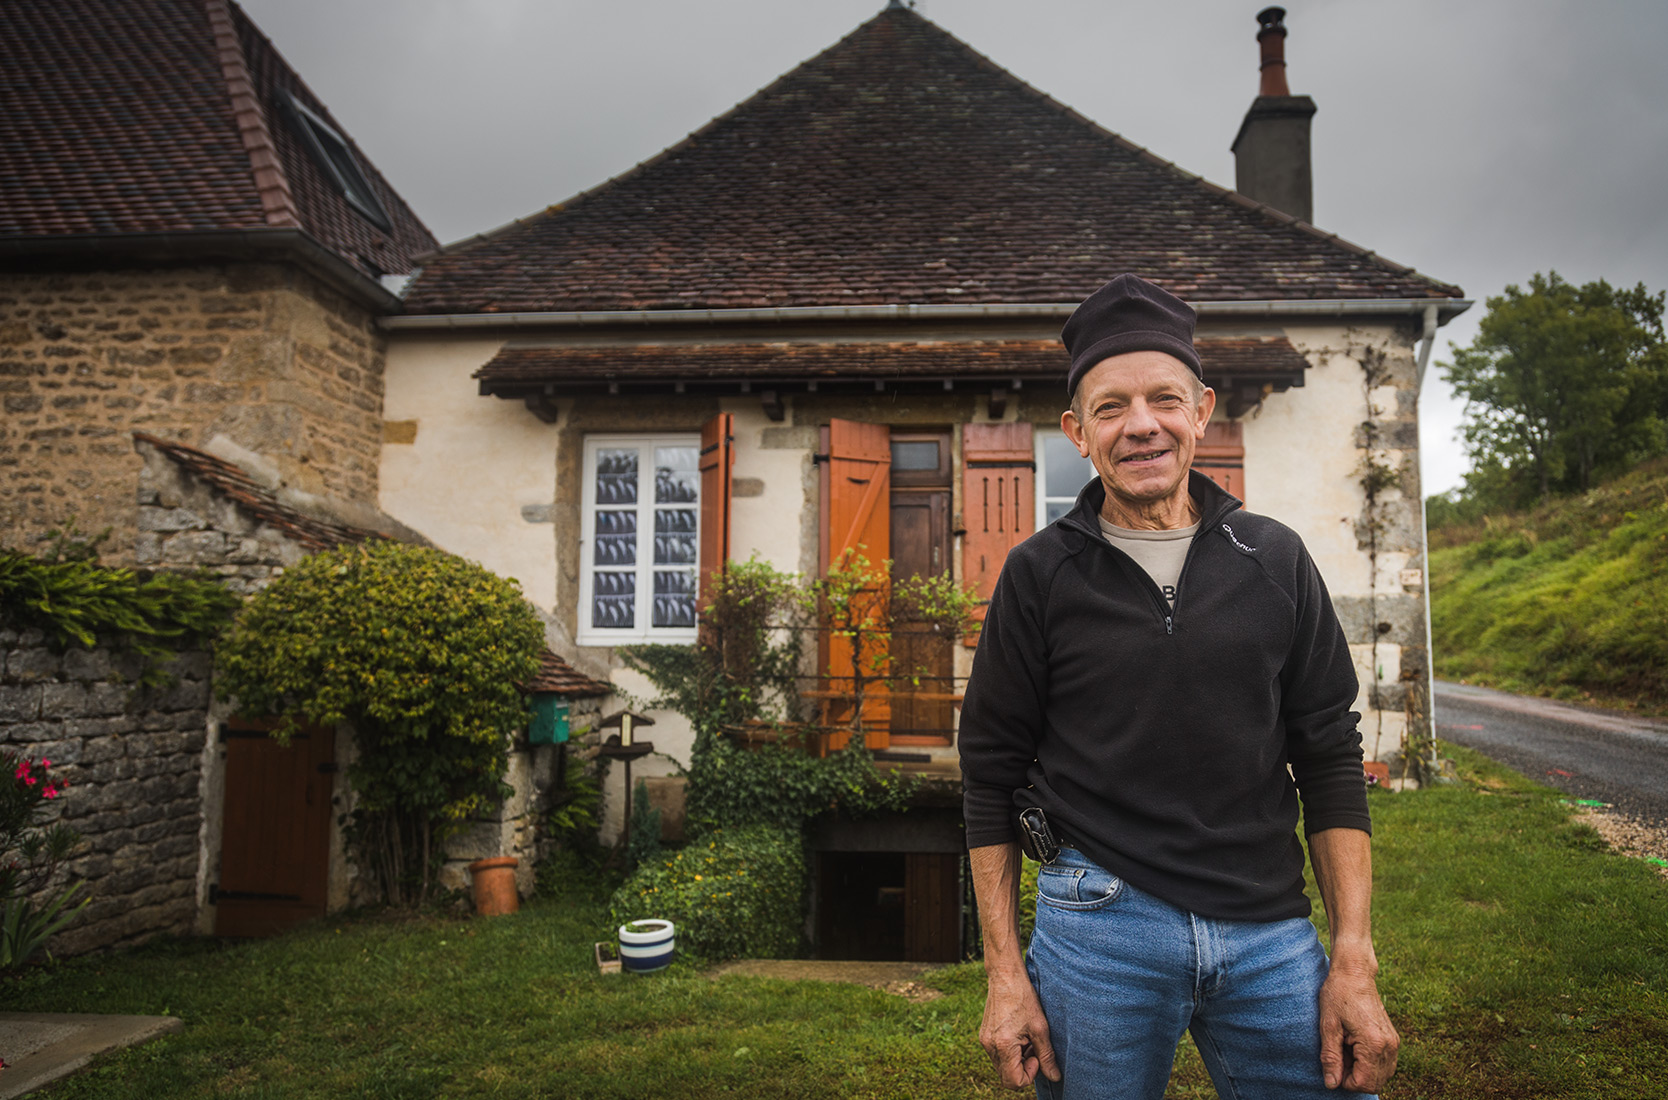 Bernard at the Domaine De Cromey